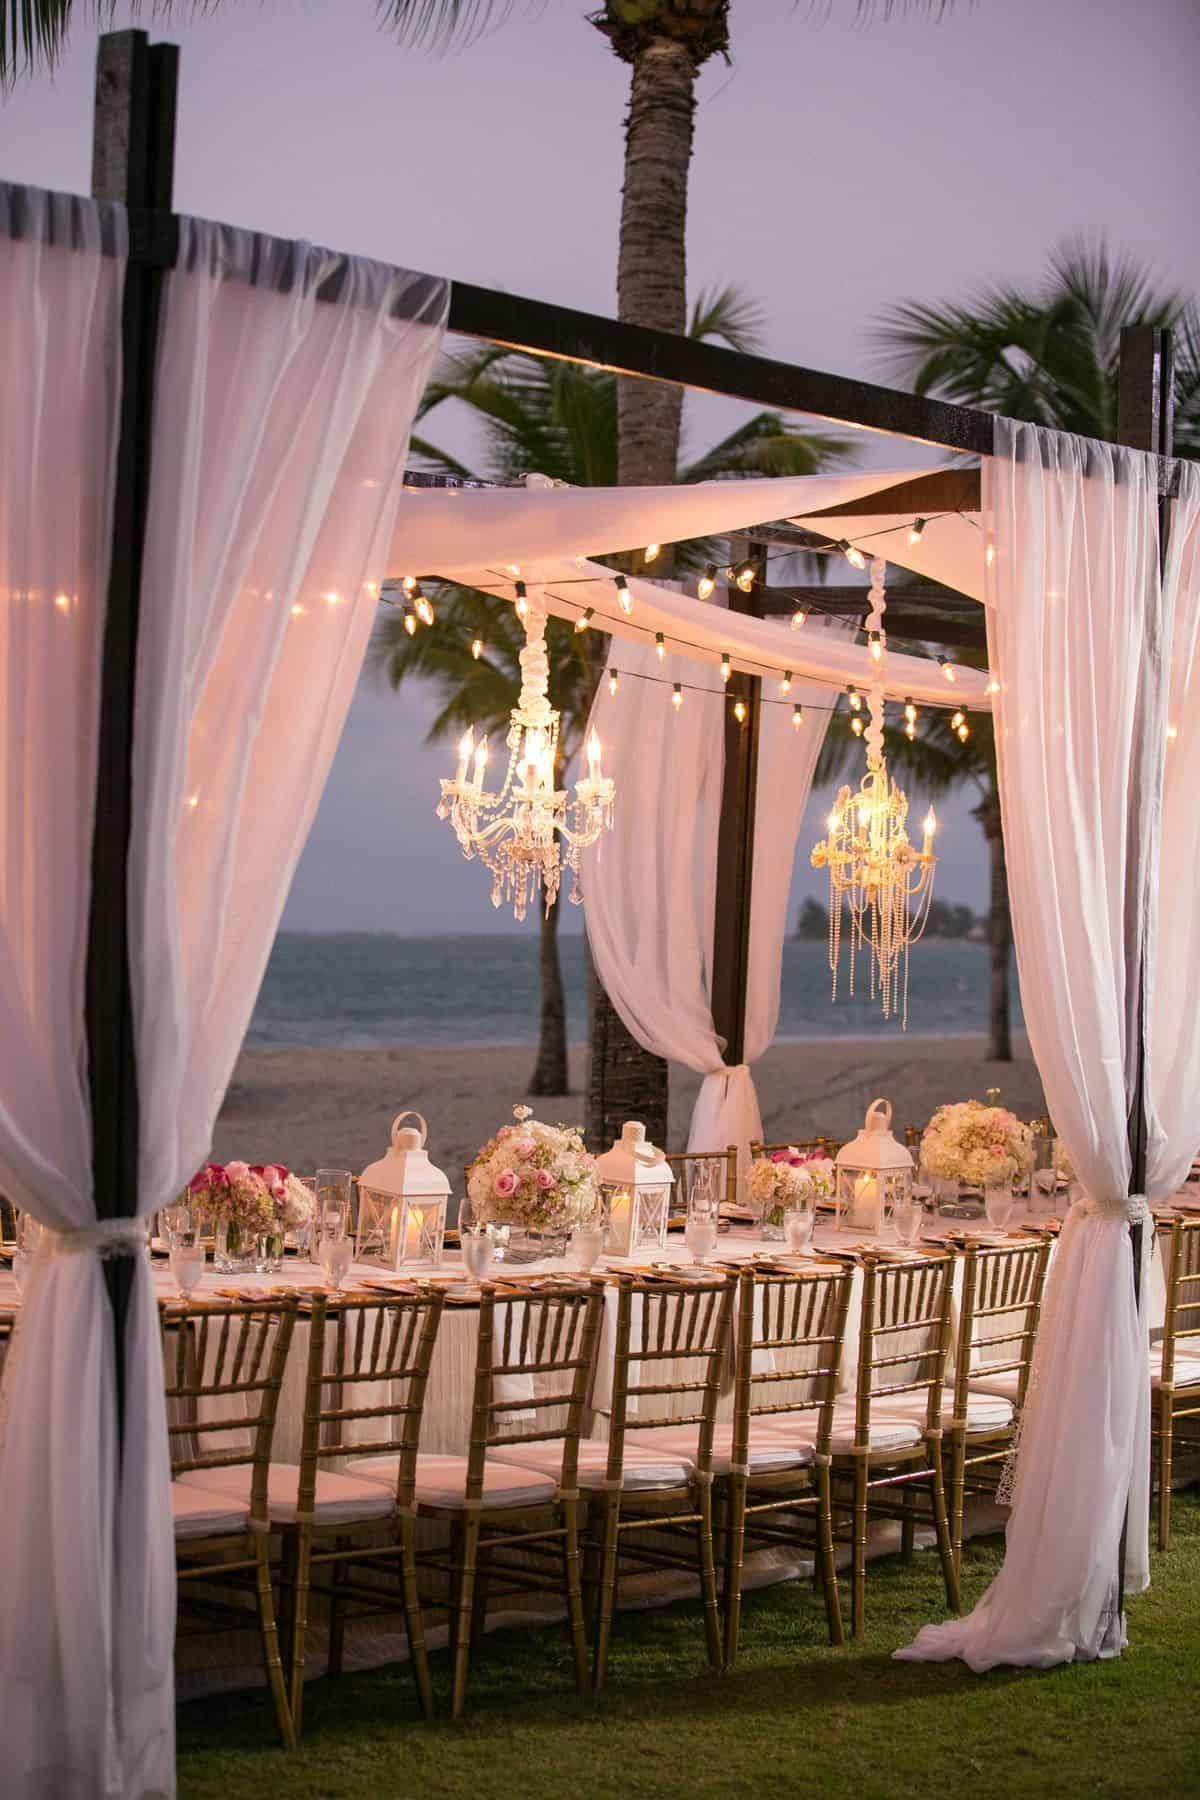 destination wedding caribbean best photos - Cute Wedding ...